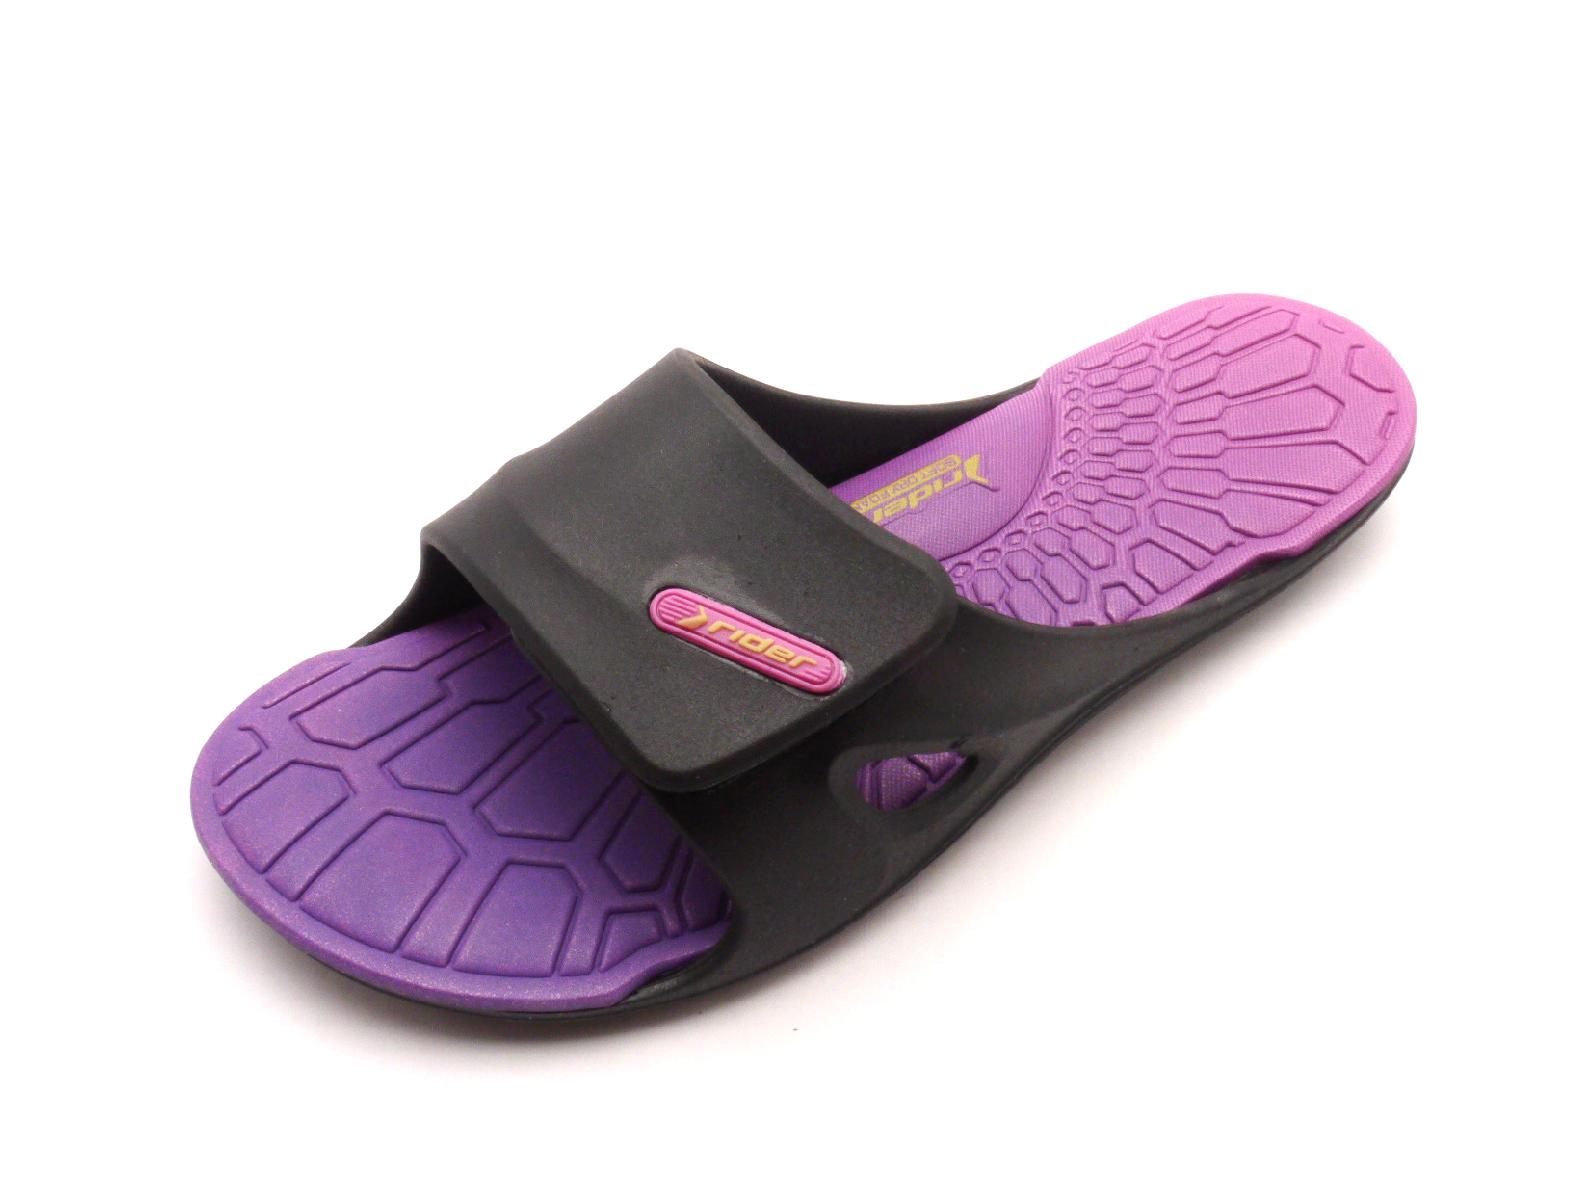 Dámské pantofle Rider 81921 Velikost: 41-42